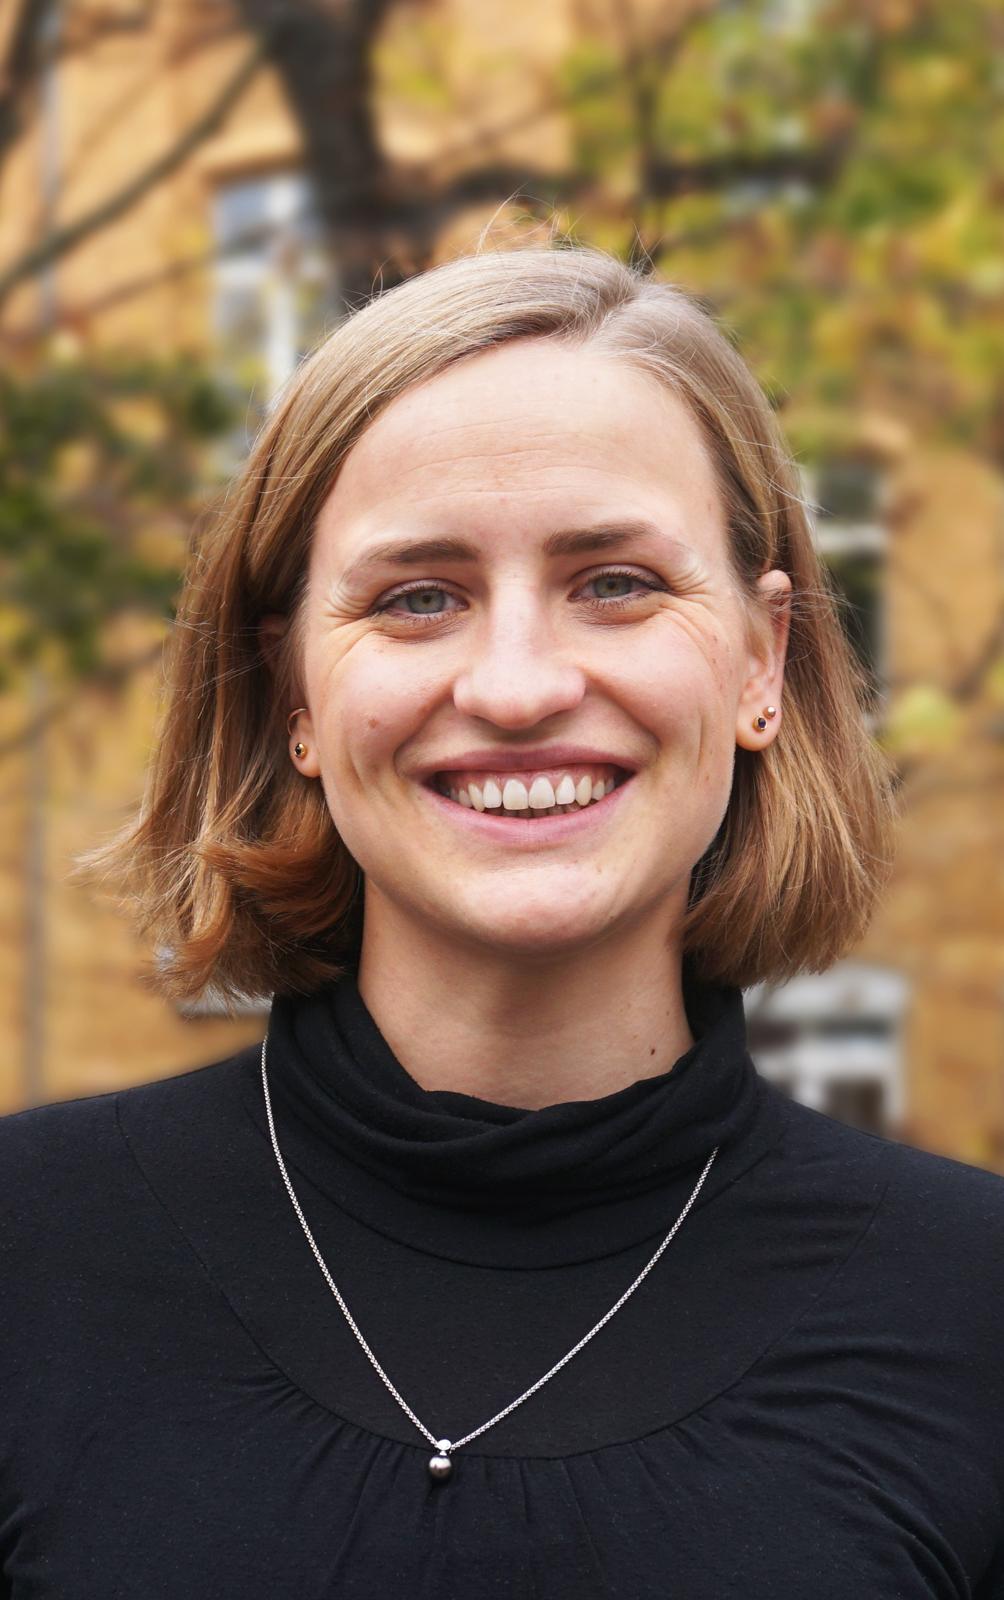 CleverShuttle Gesa Gräf